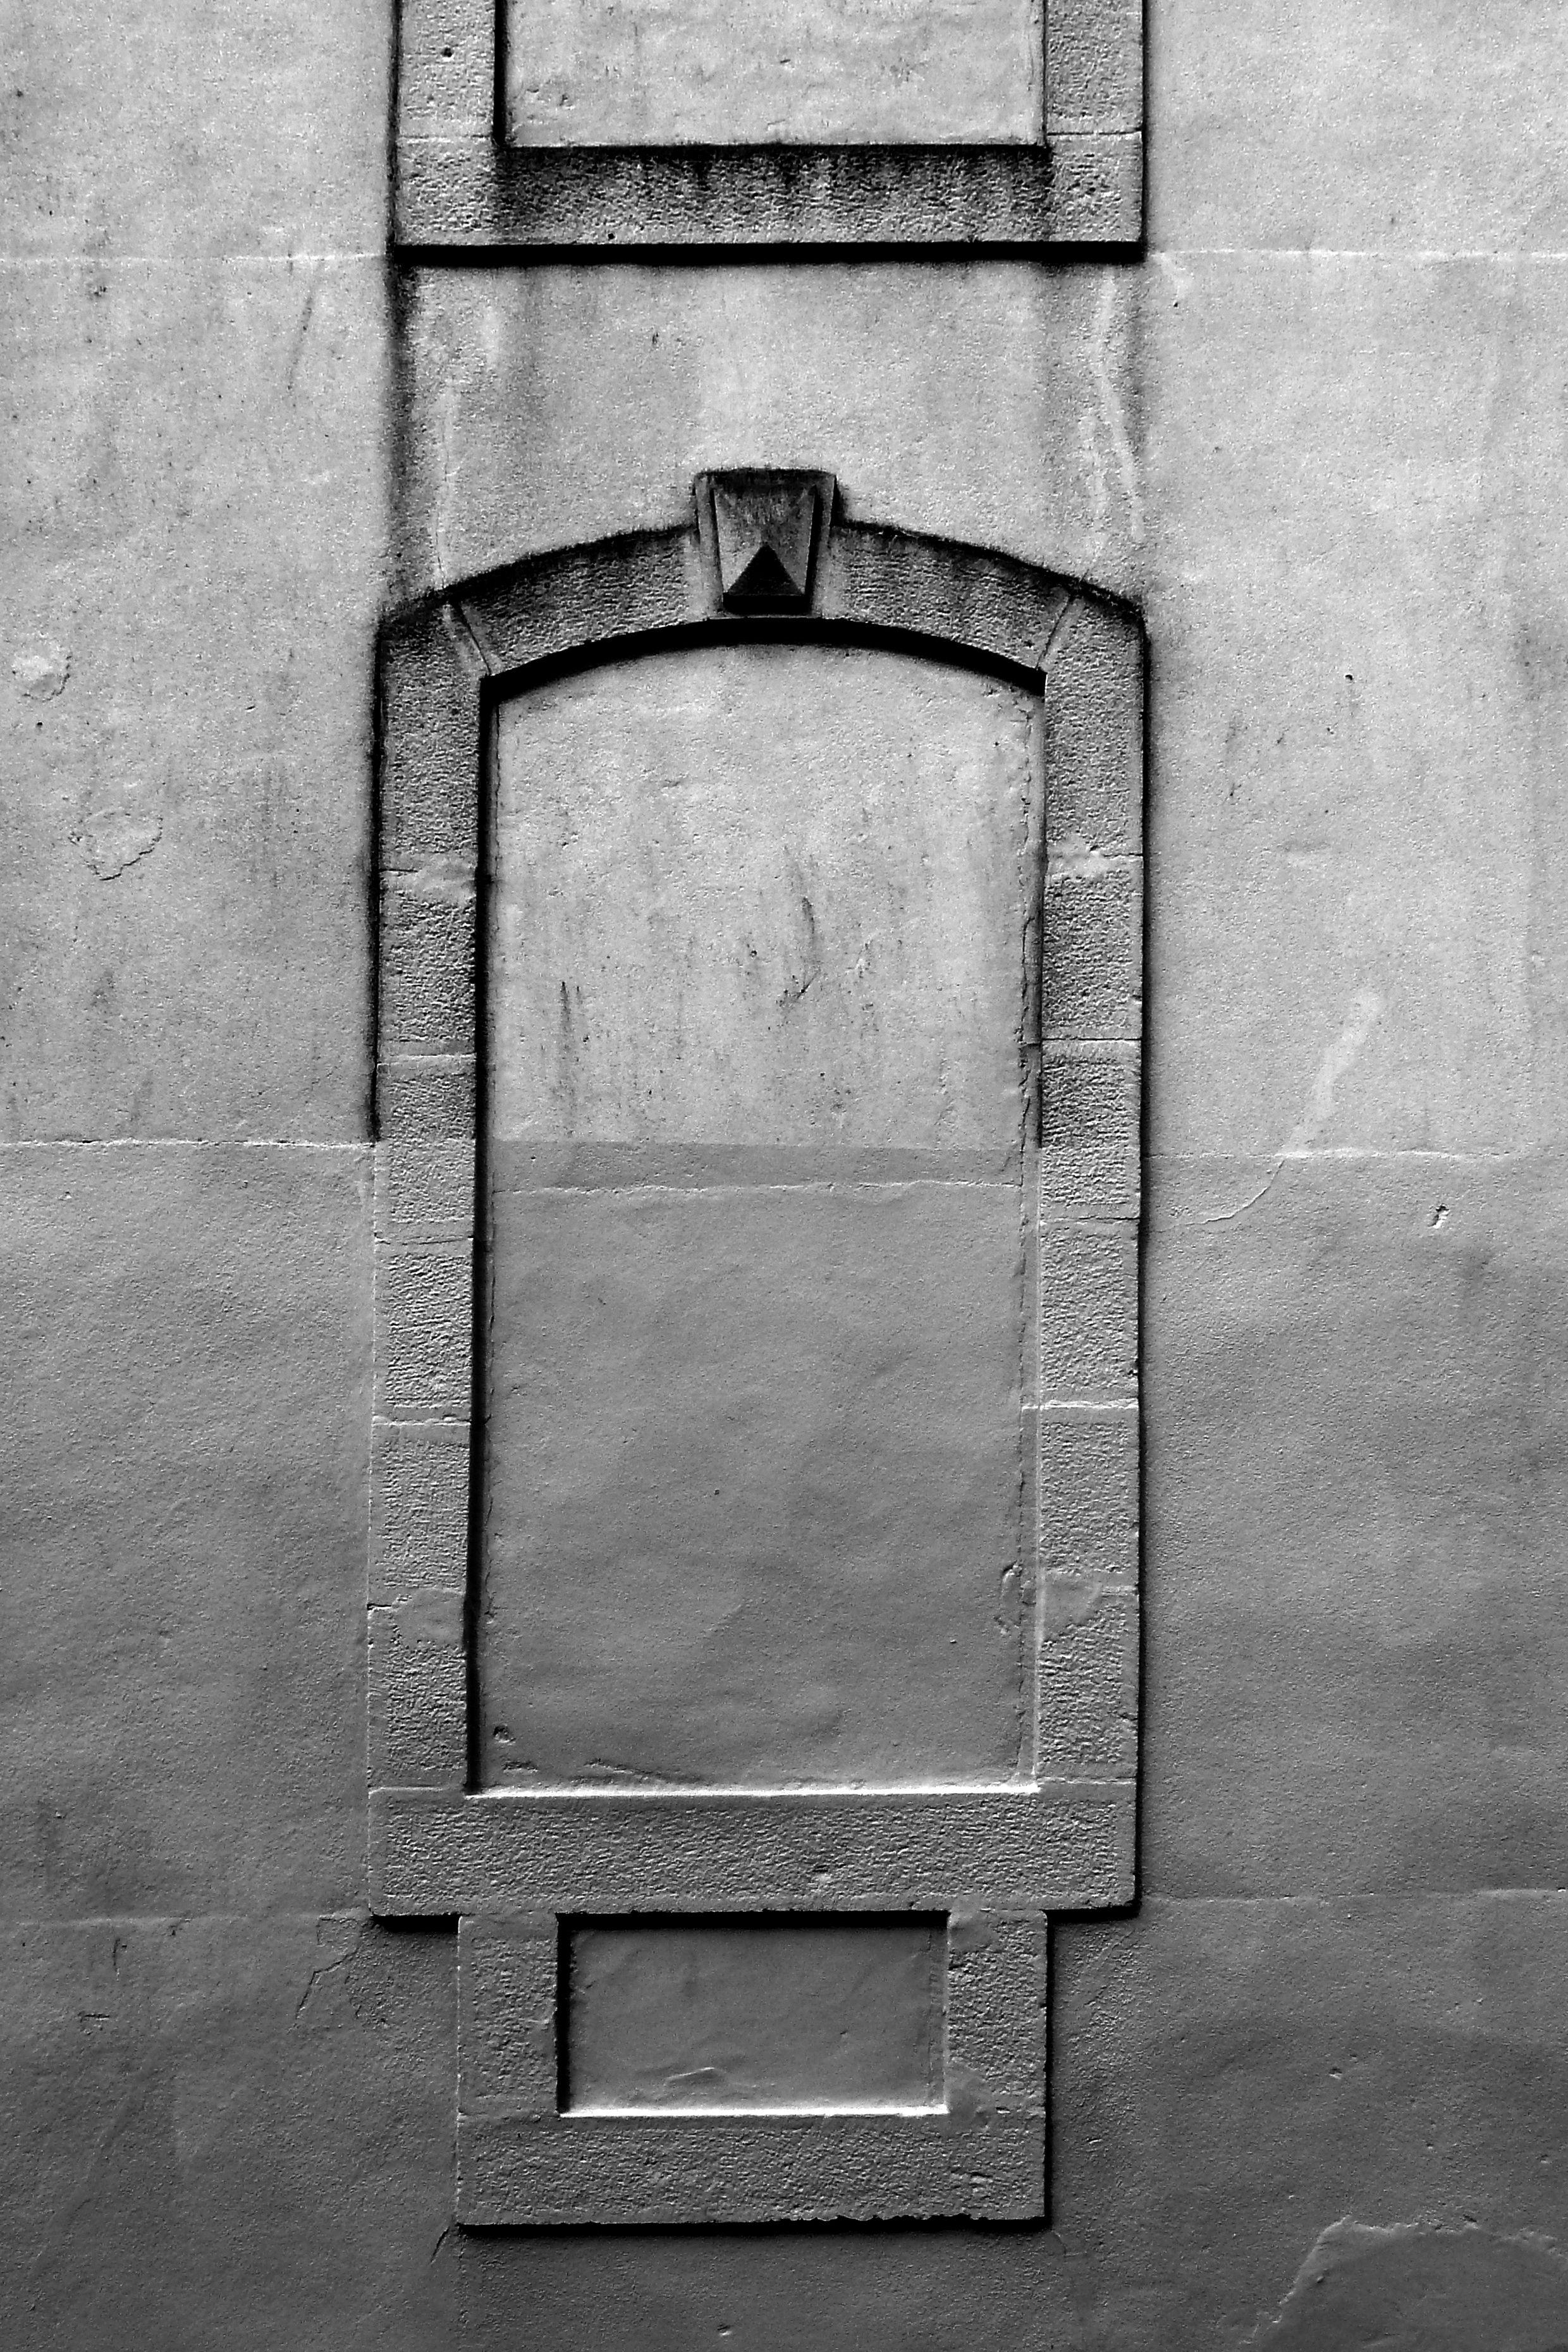 B & W | photography | Benoit Furet